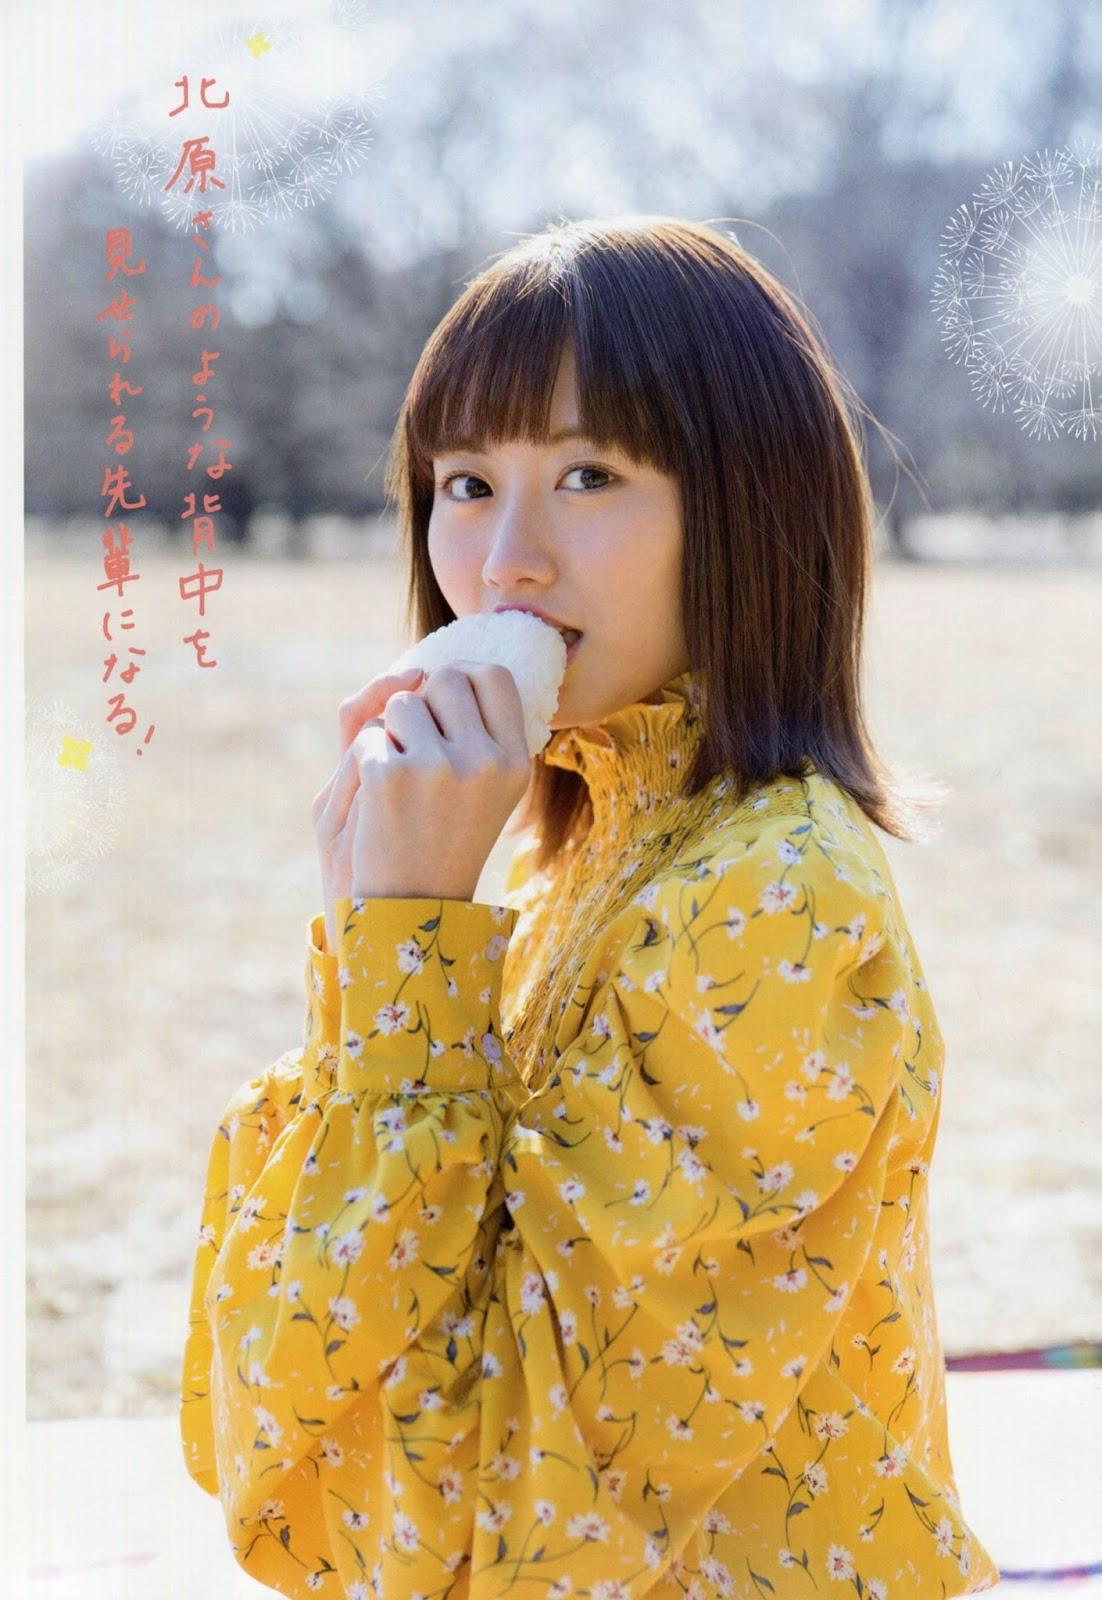 Nishigata Marina 西潟茉莉奈, Flash Special Gravure Best 2018 New Year